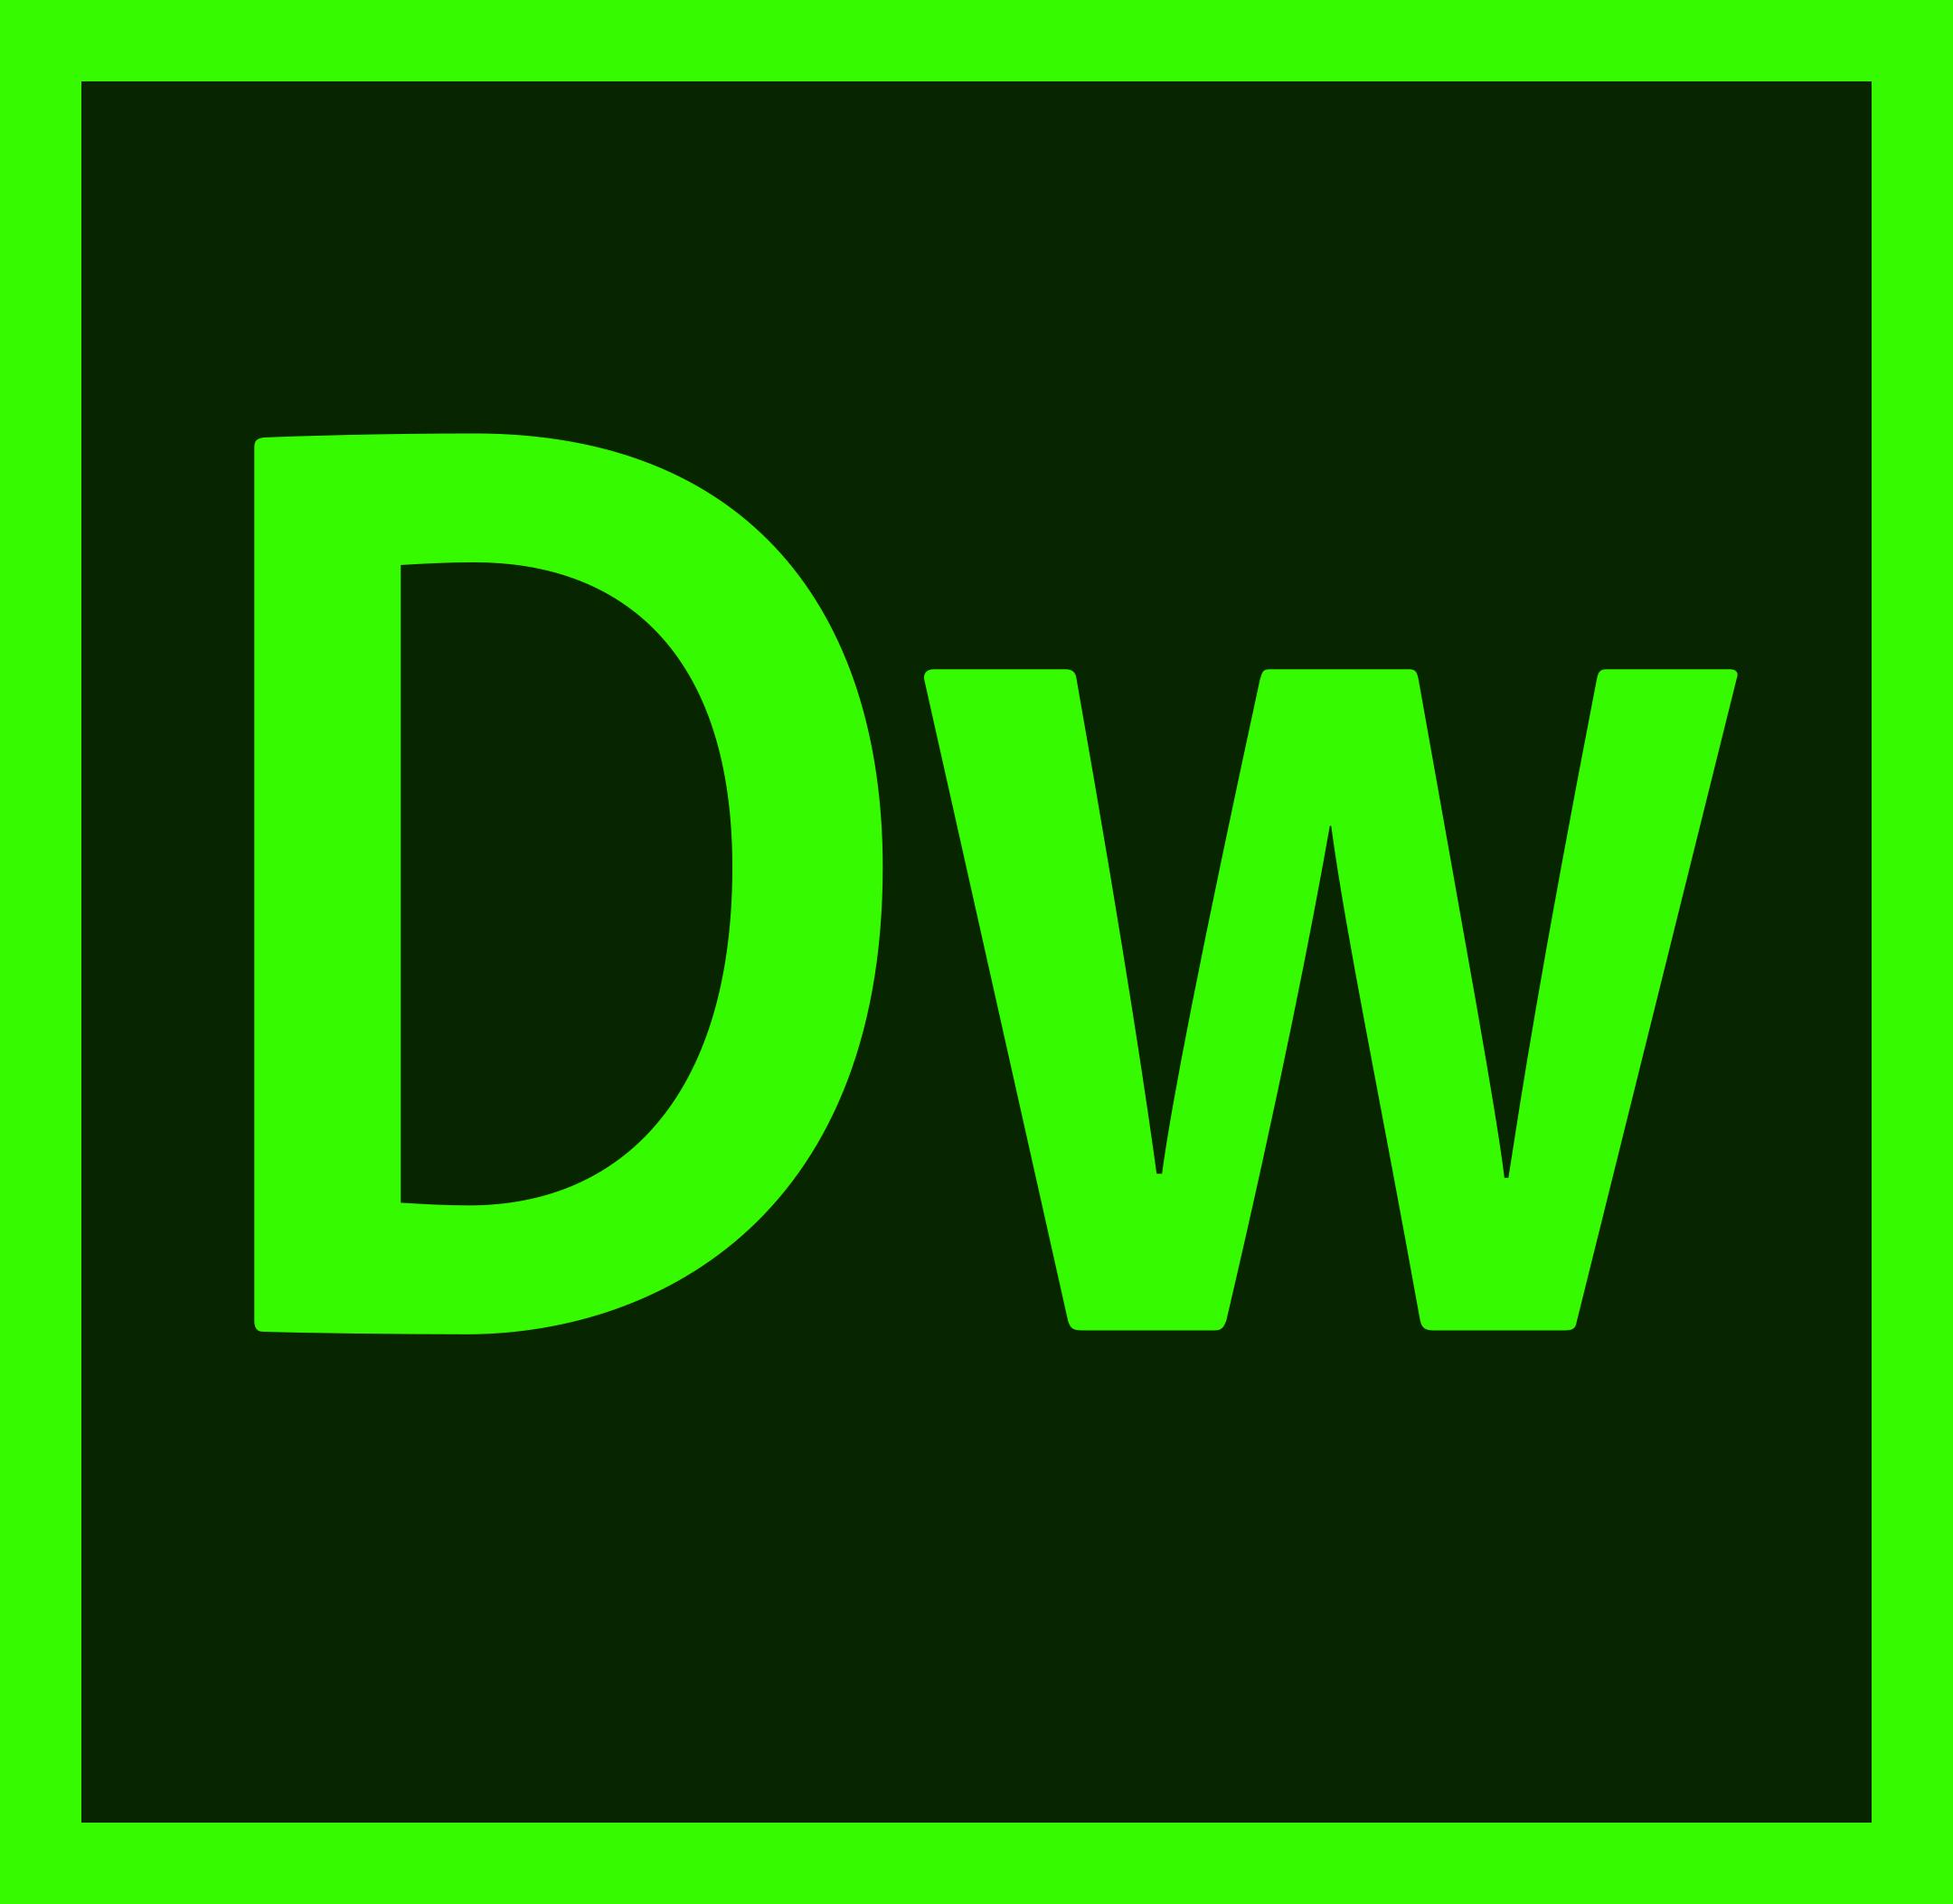 adobe dreamweaver logo 1 - Adobe Dreamweaver Logo